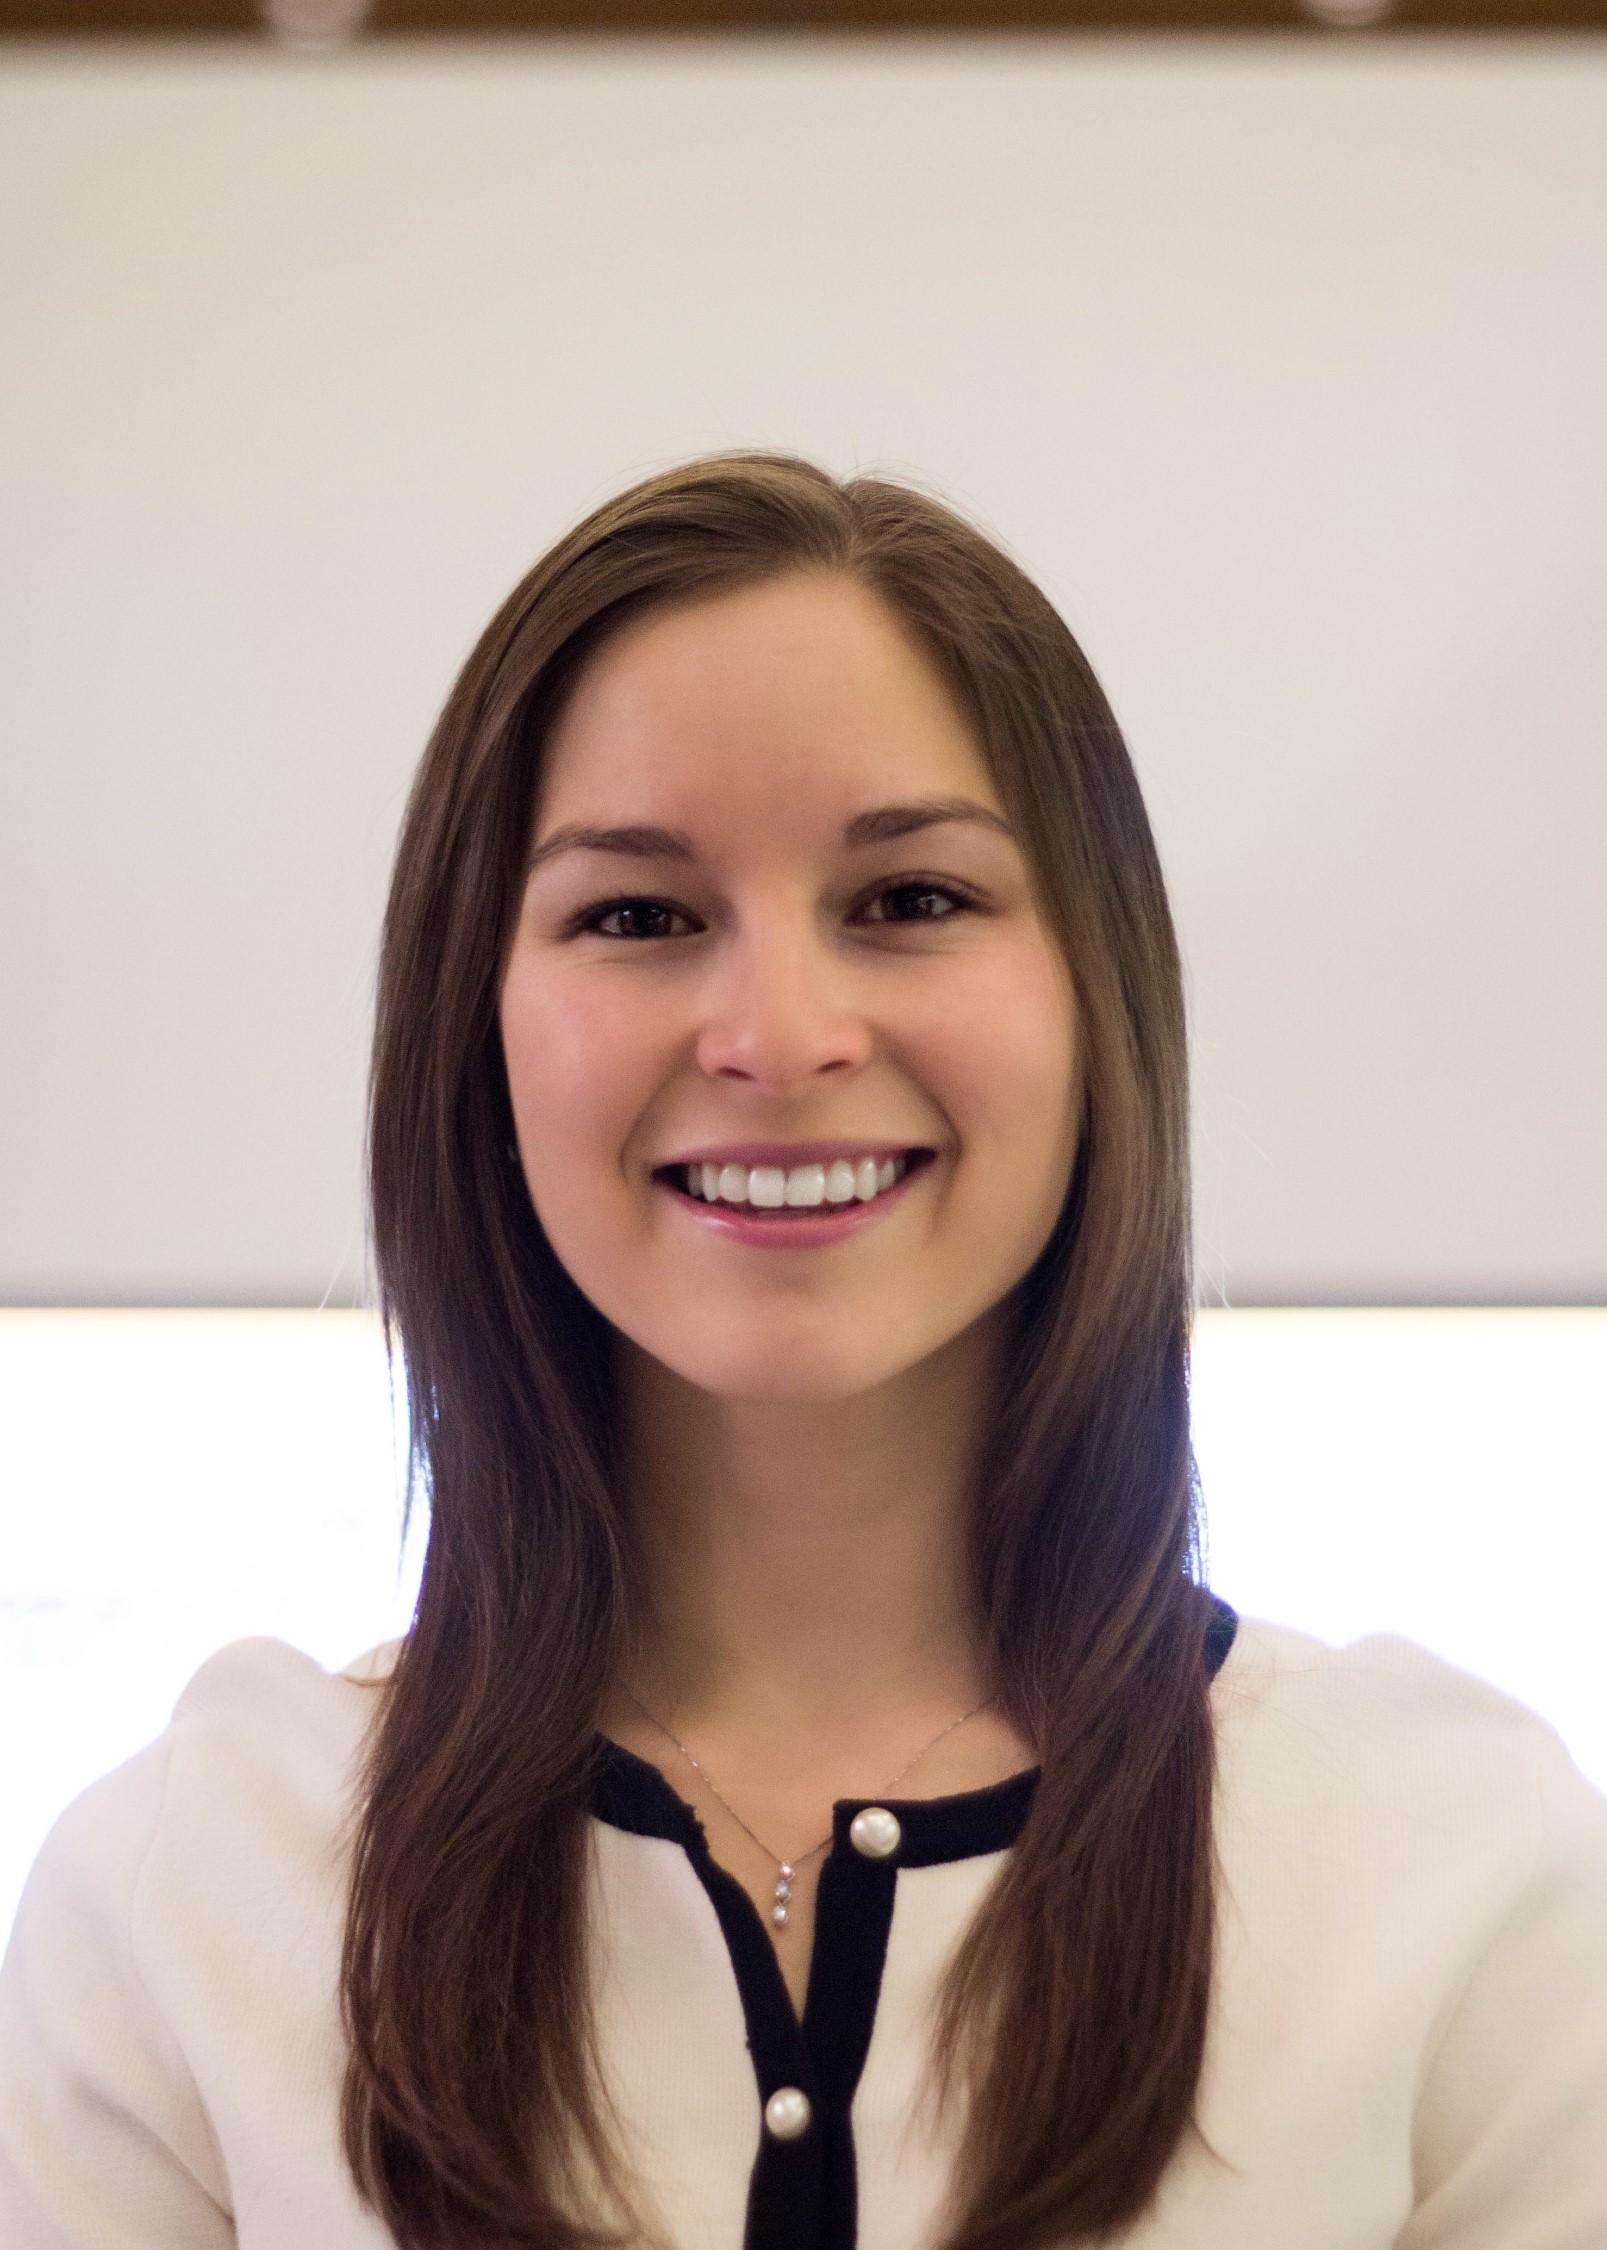 Erica Demond   Associate at The Boston Consulting Group  Economics